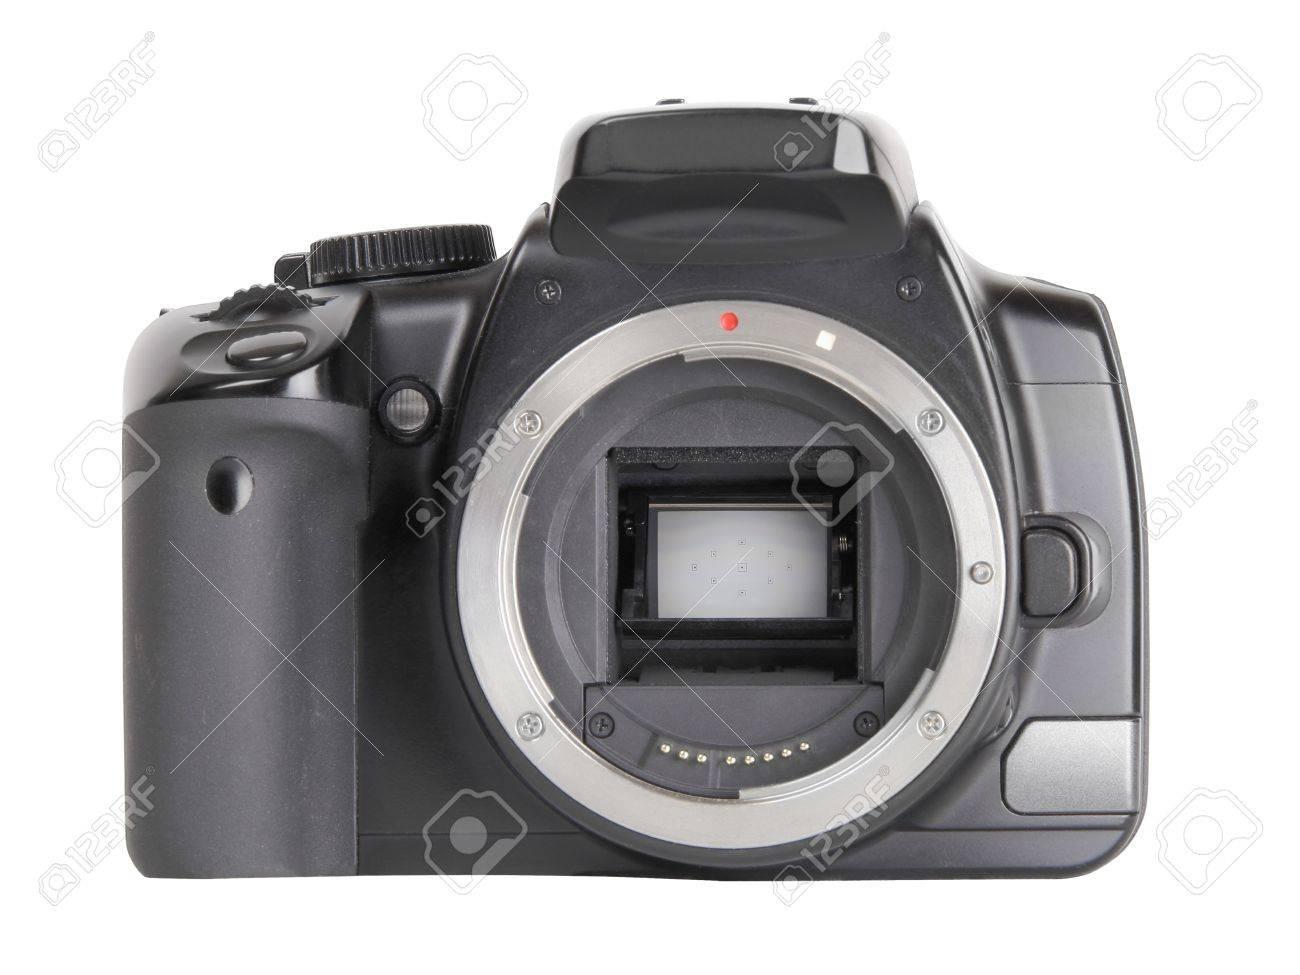 Camera Dslr Camera Without Lens black digital slr camera without lens isolated on white background stock photo 8662485